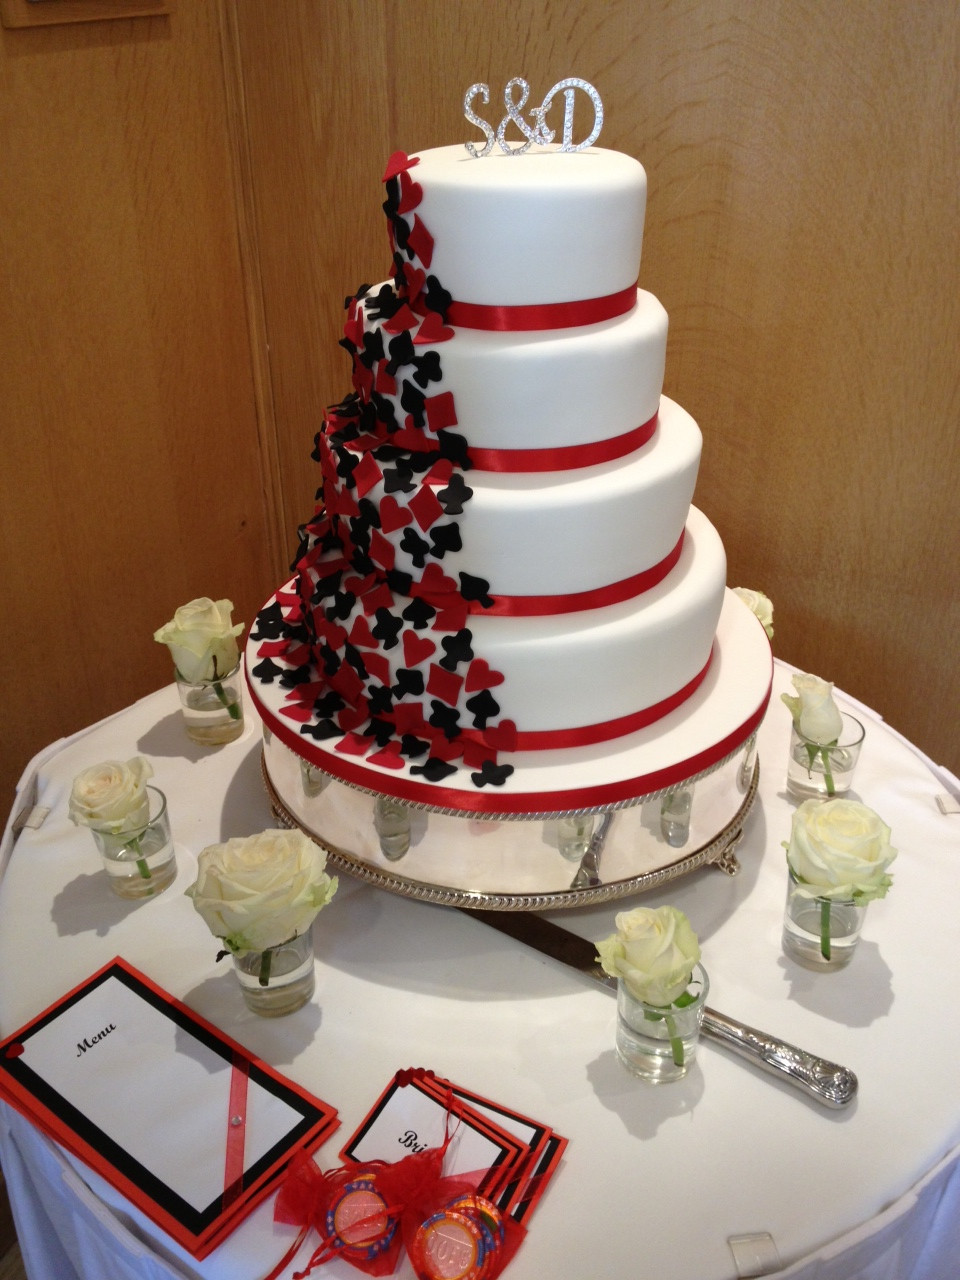 Best Wedding Cakes Las Vegas  Wedding cakes in vegas idea in 2017